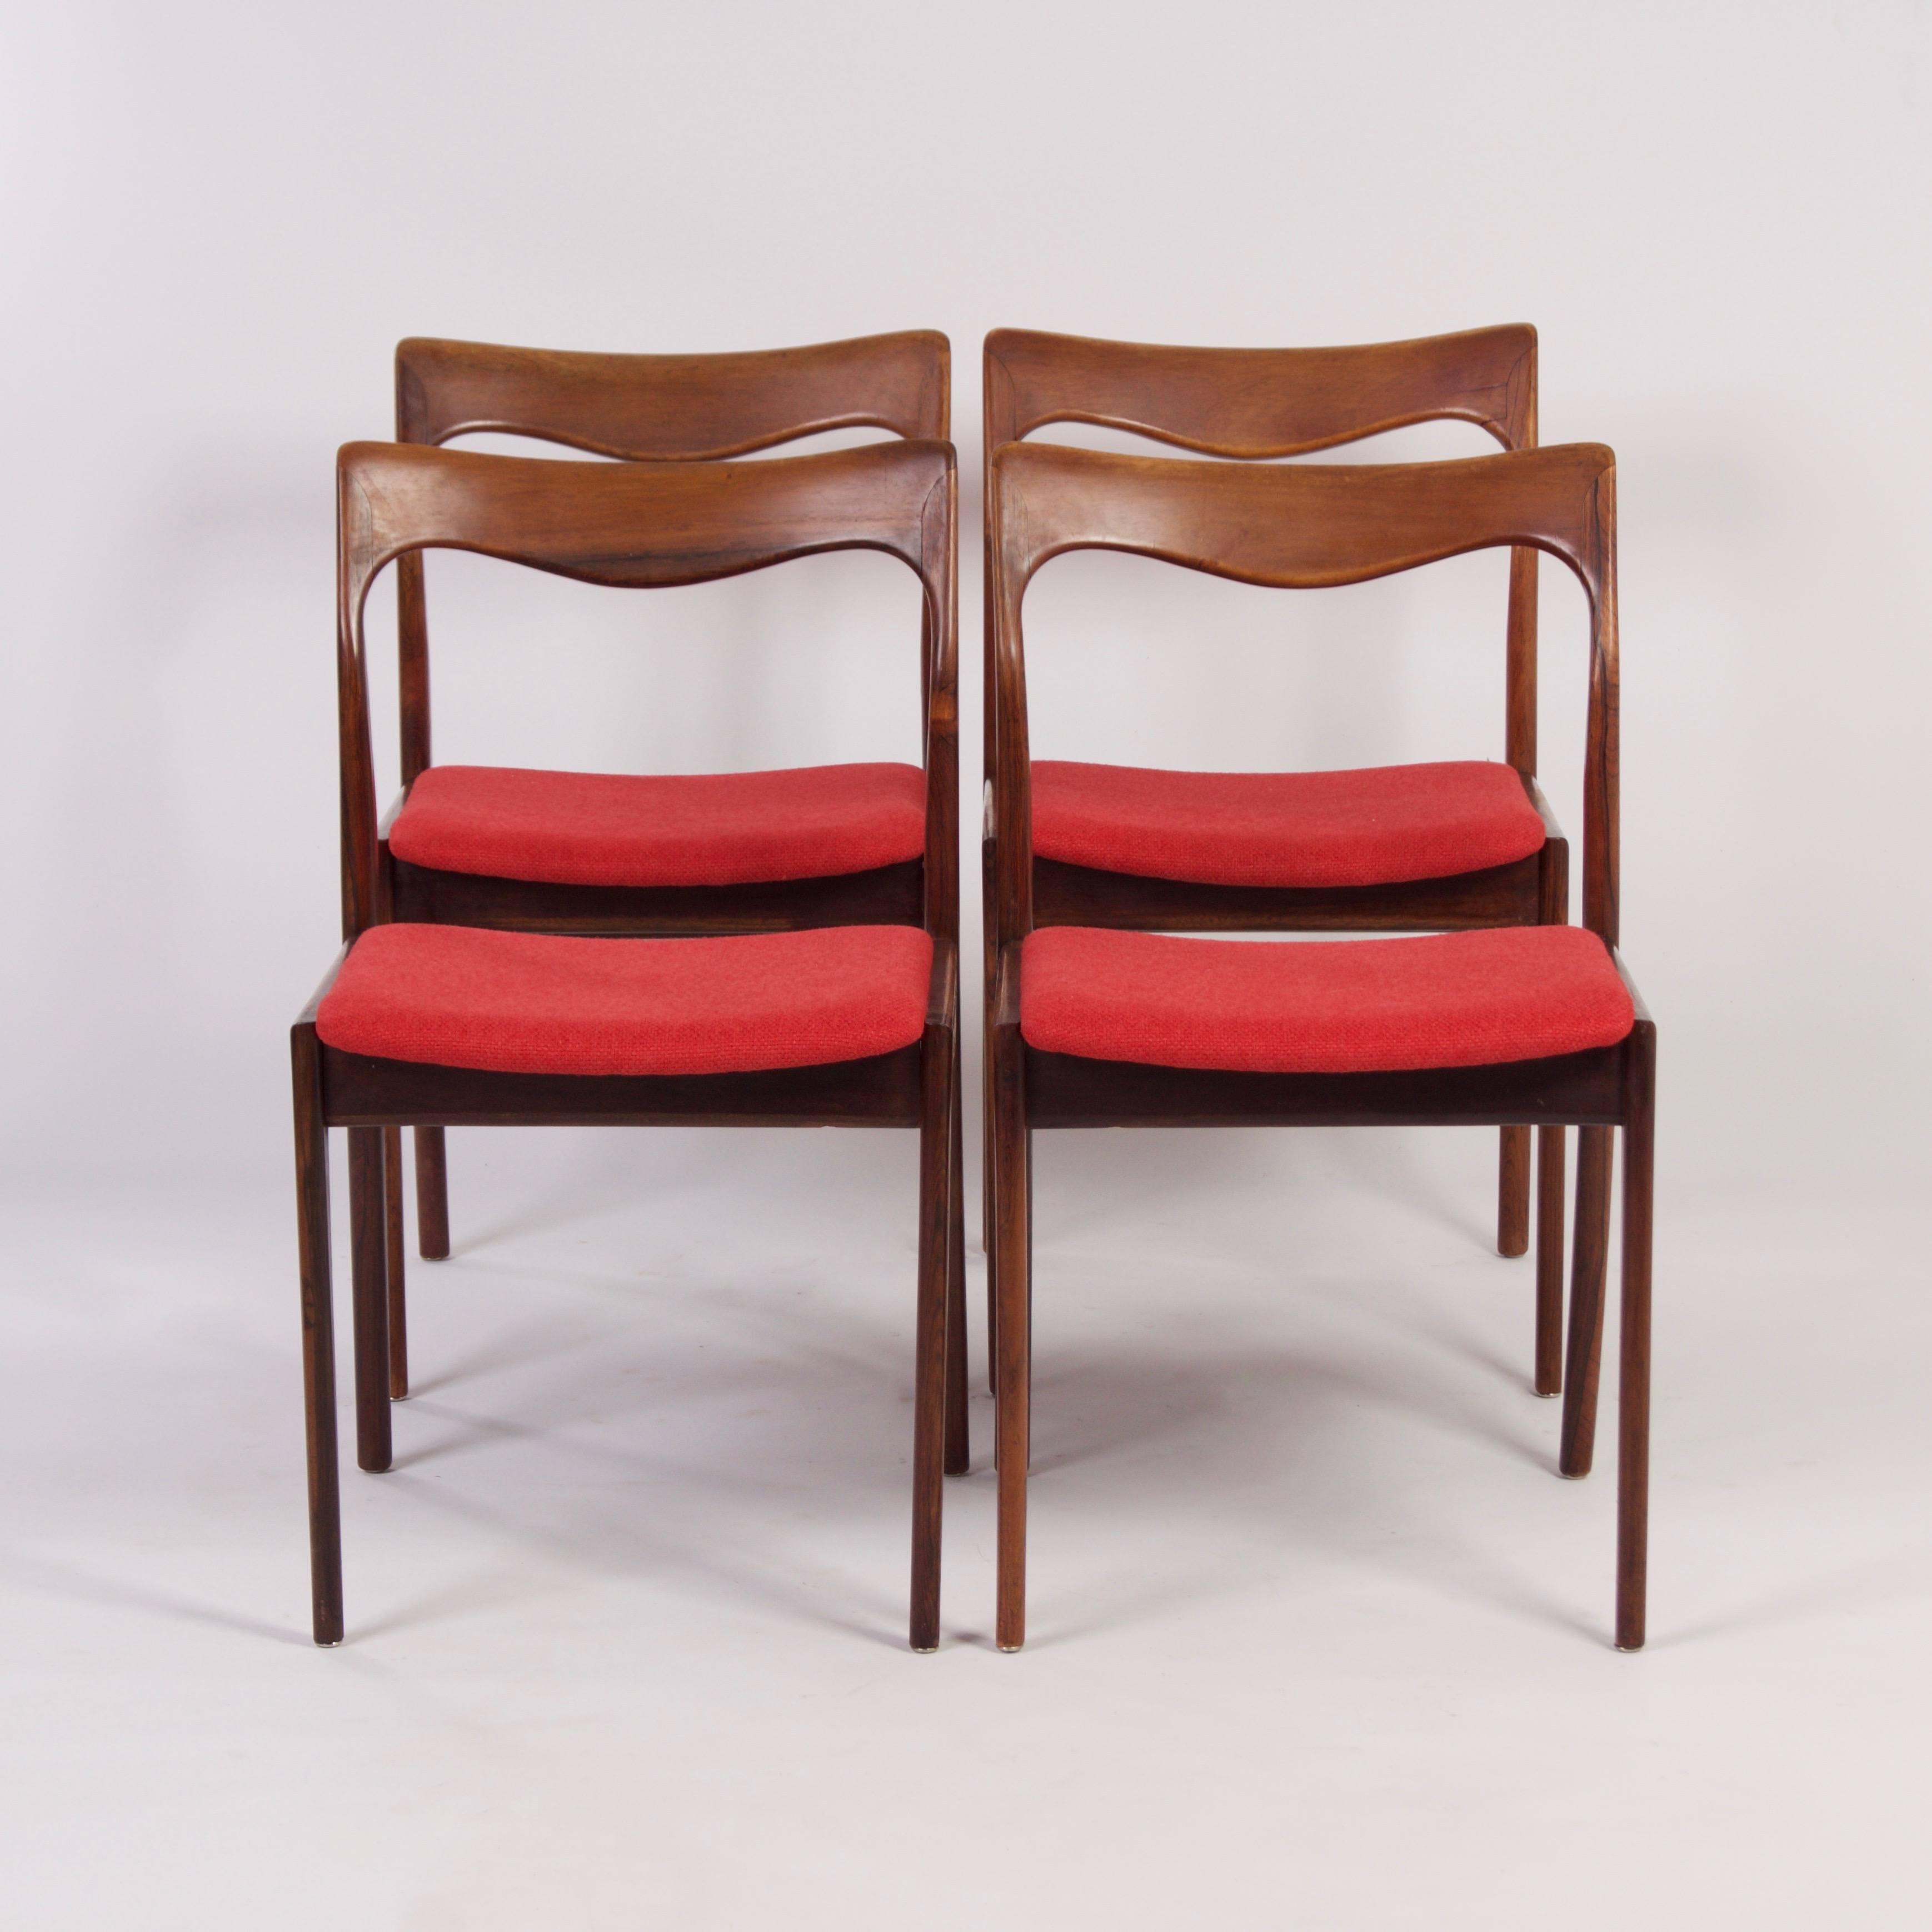 Vintage | Rode Palissander Eetkamer Stoelen van AWA - 1960s, set van ...